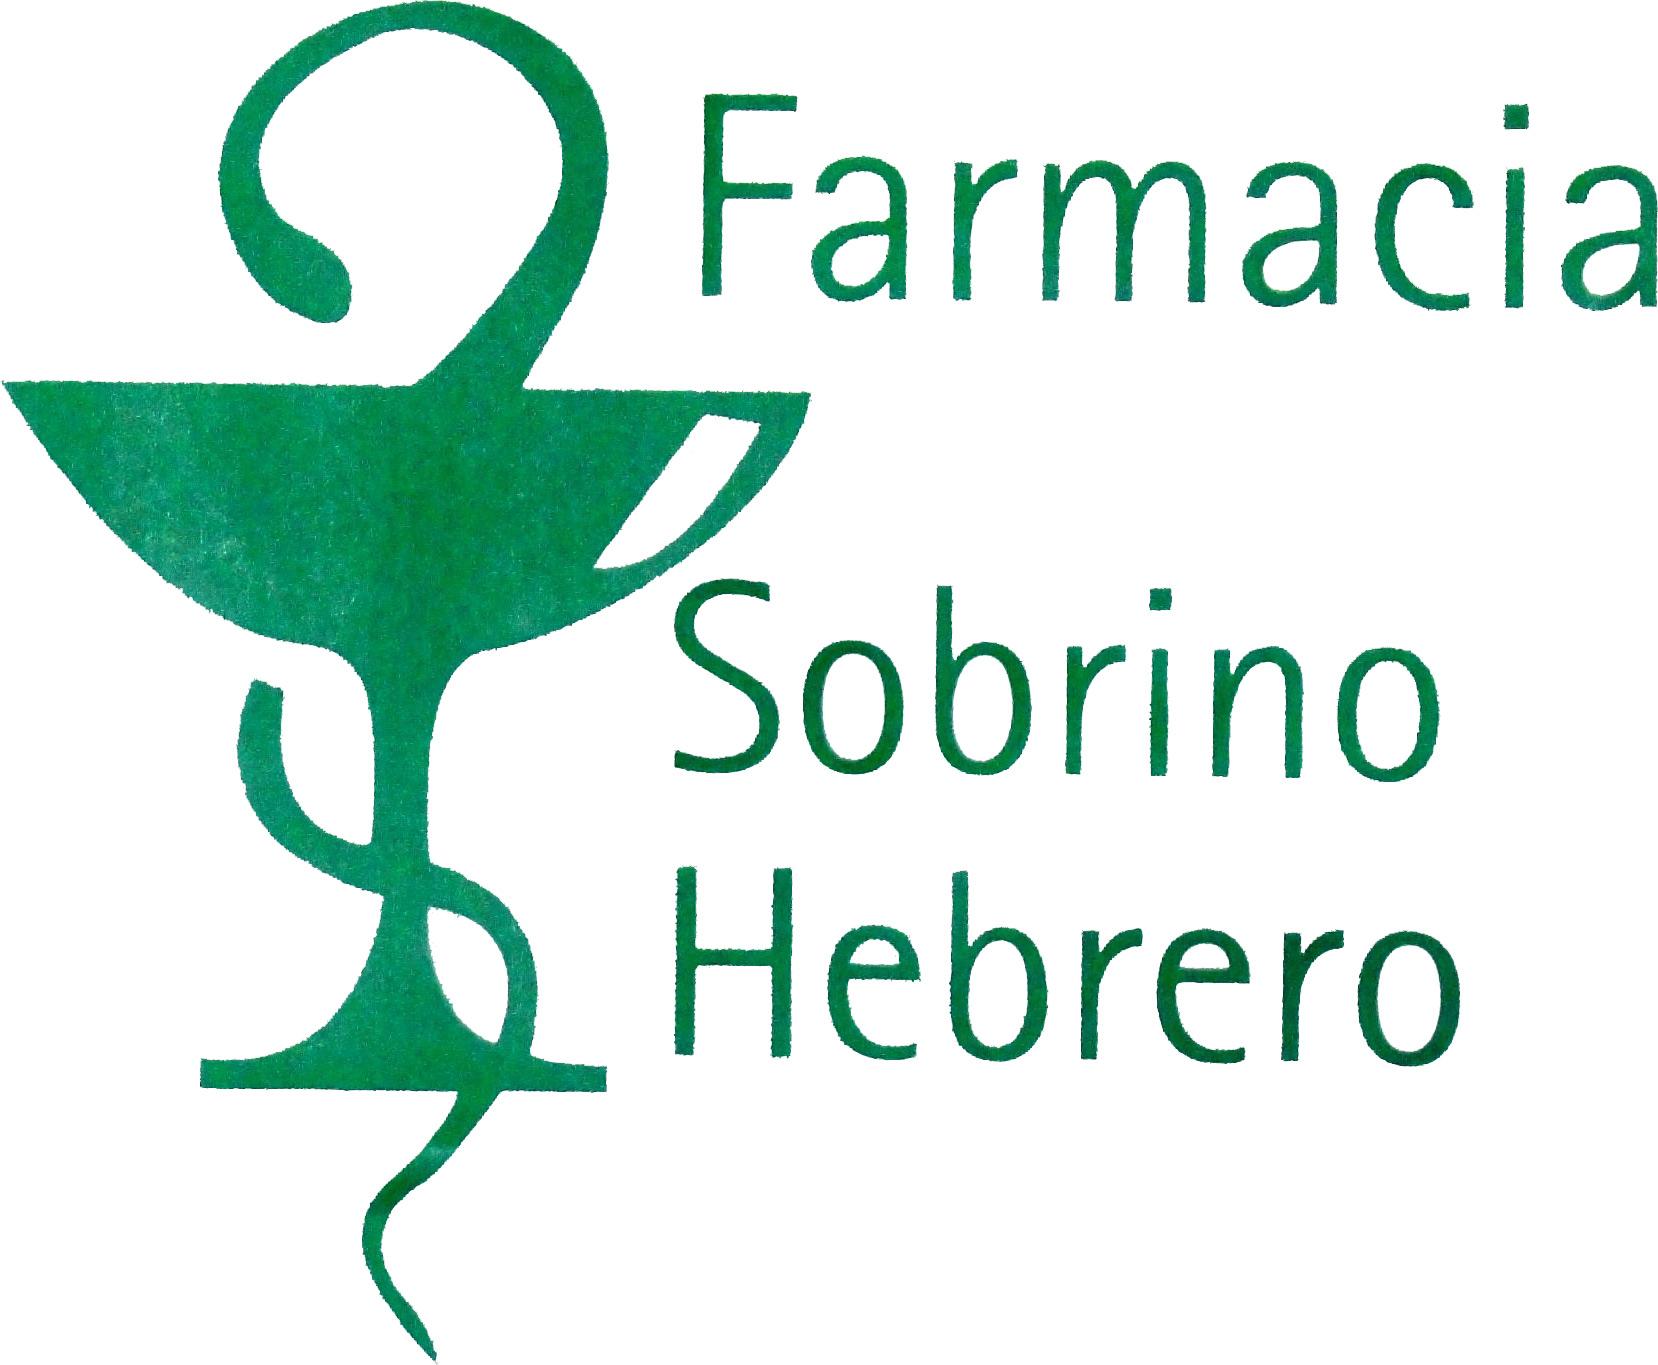 Farmacia Sobrino Hebrero